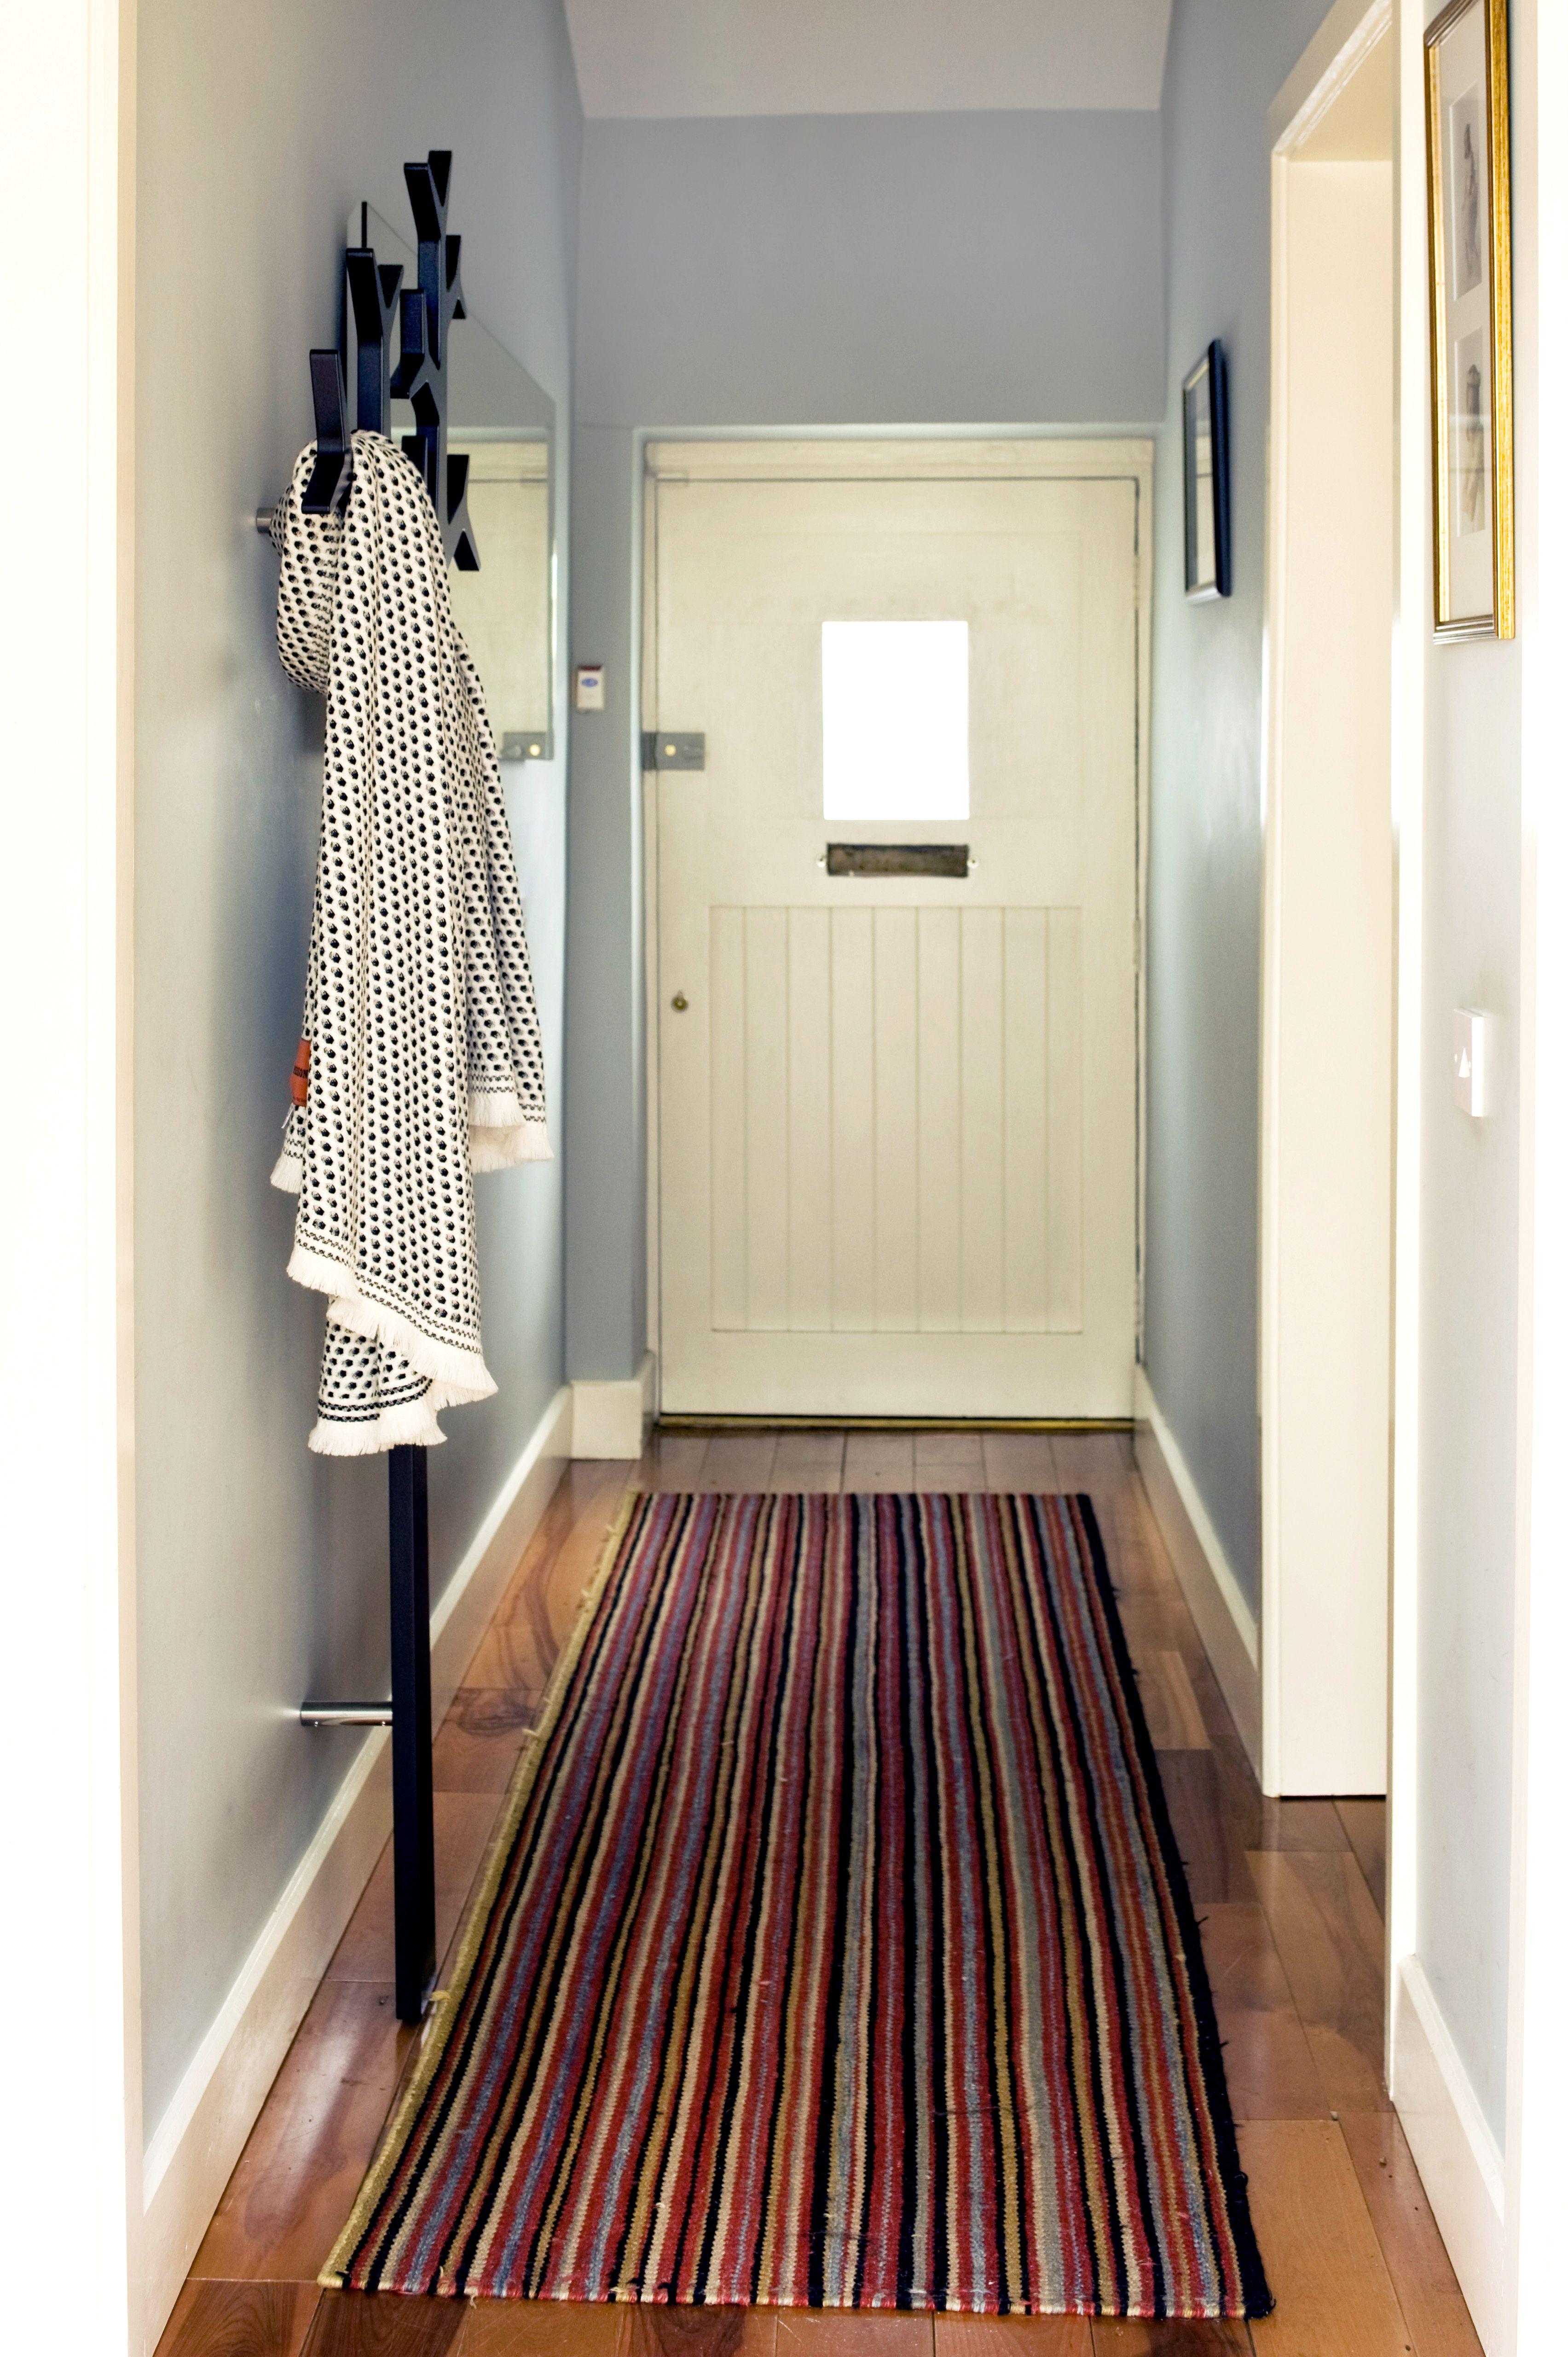 Residential entrance hallway carpet runner soft for Hall entrance door designs